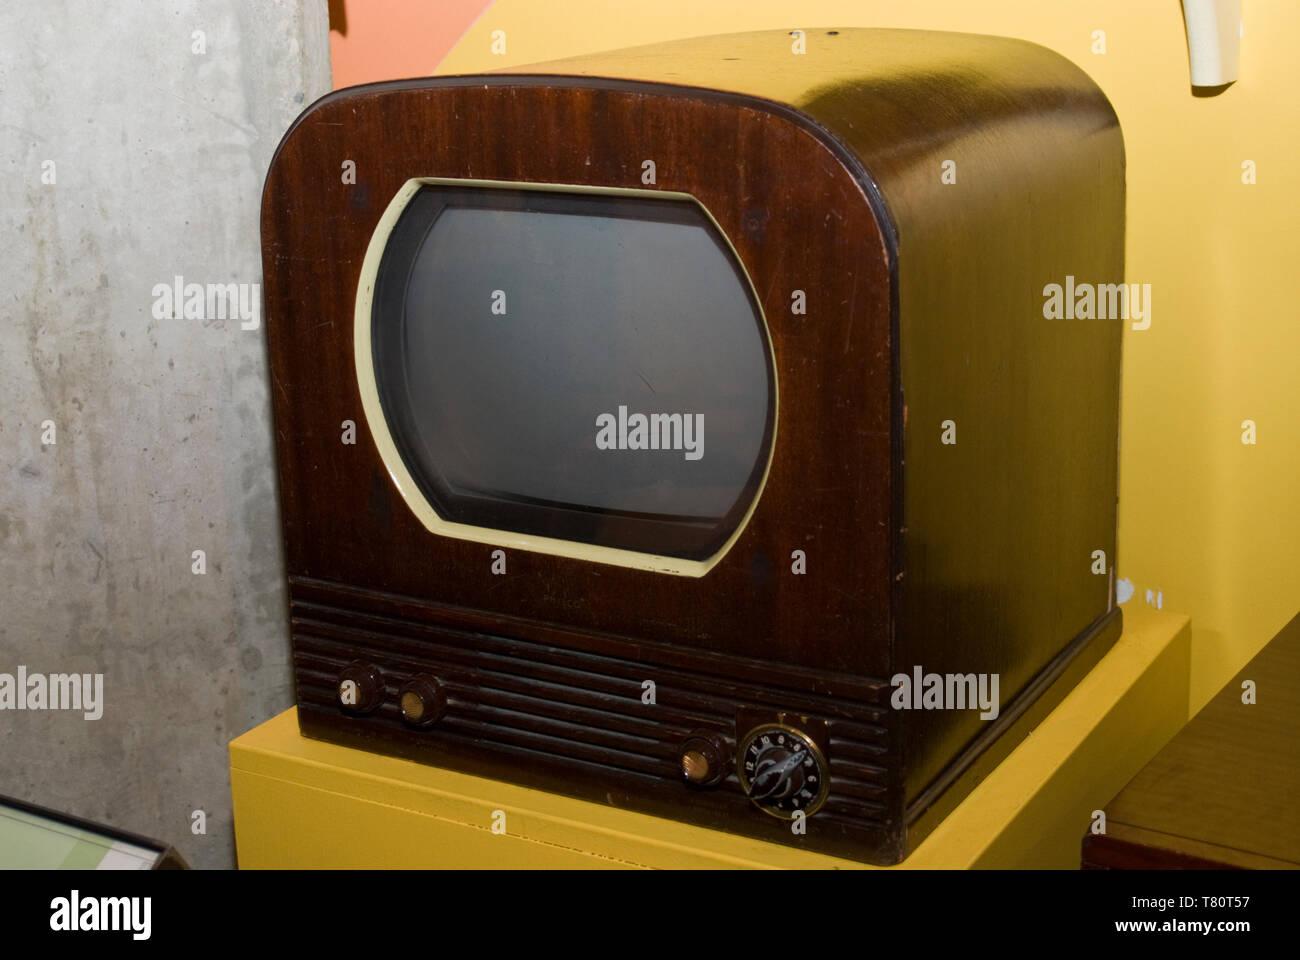 Minneapolis, Minnesota. Mill City Museum. Philco television from the 1950s. - Stock Image